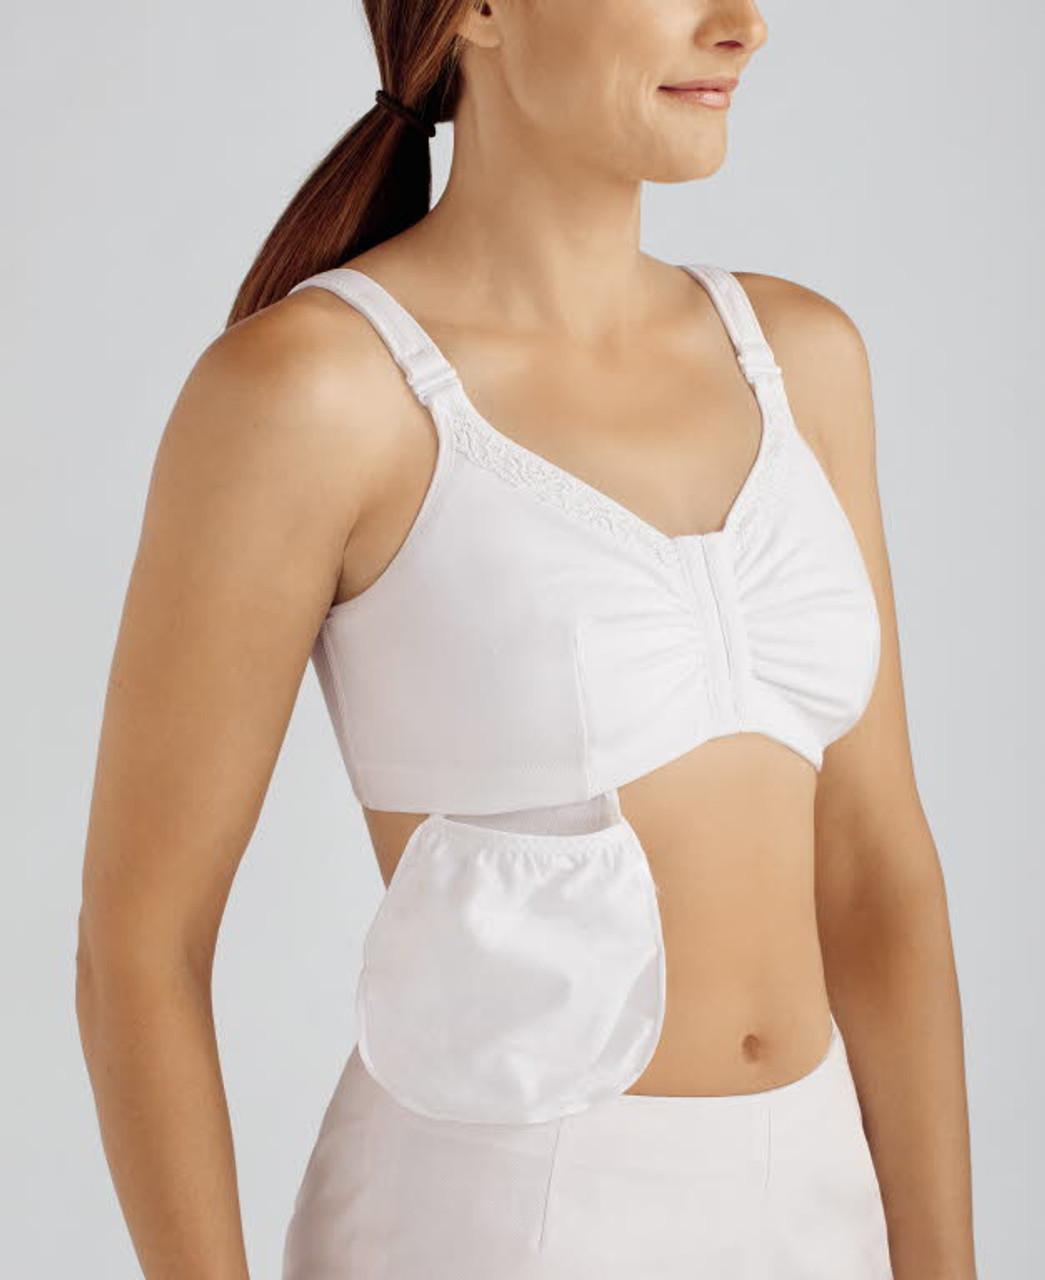 43224b84dc16a Amoena 2160 Hannah wire-free bra kit - MastectomyShop.com